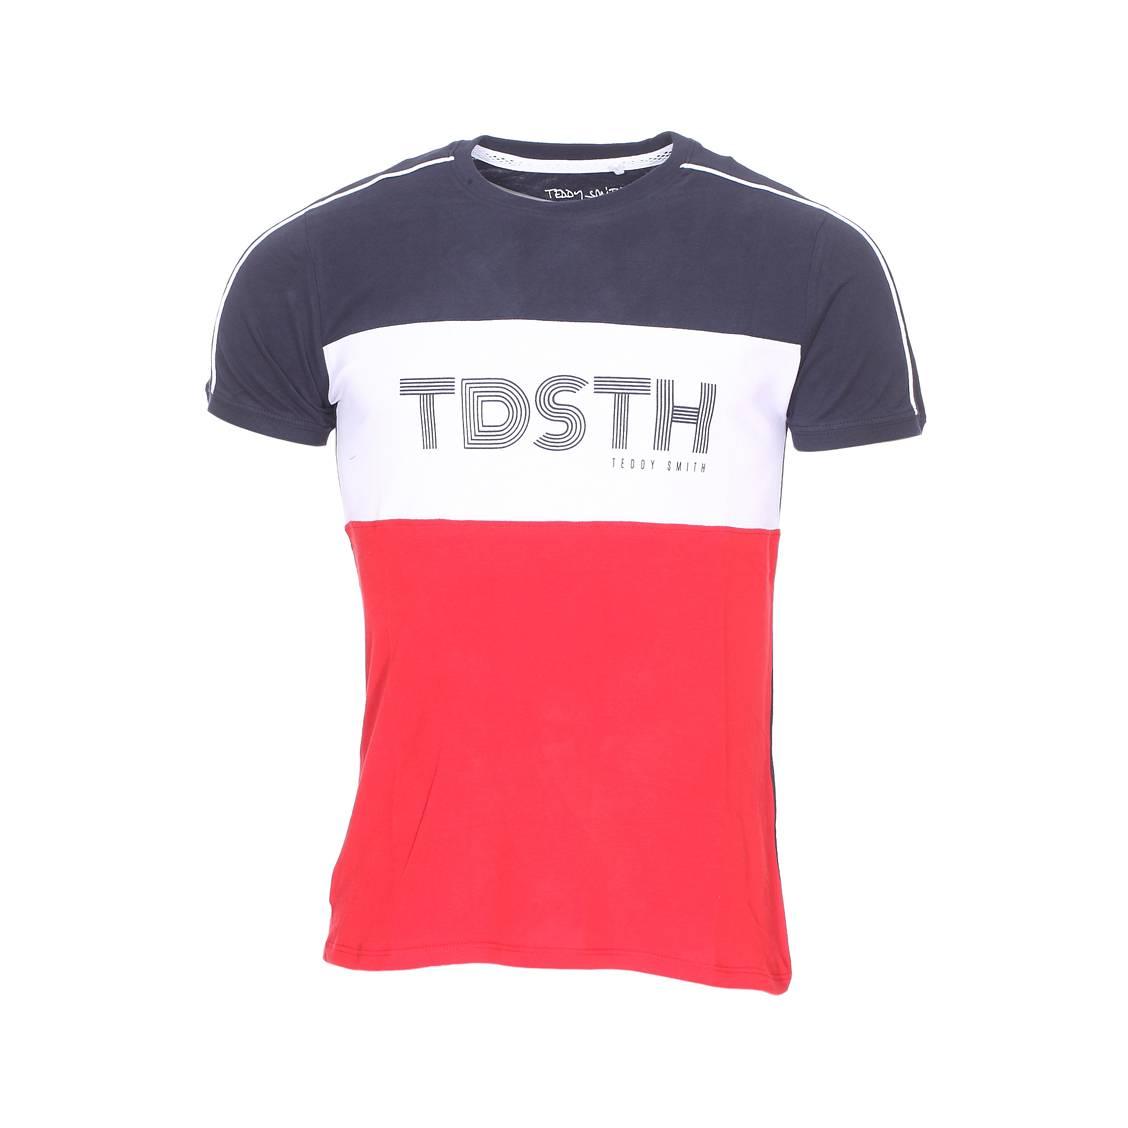 tee shirt col rond teddy smith thou en coton bleu blanc et rouge rue des hommes. Black Bedroom Furniture Sets. Home Design Ideas